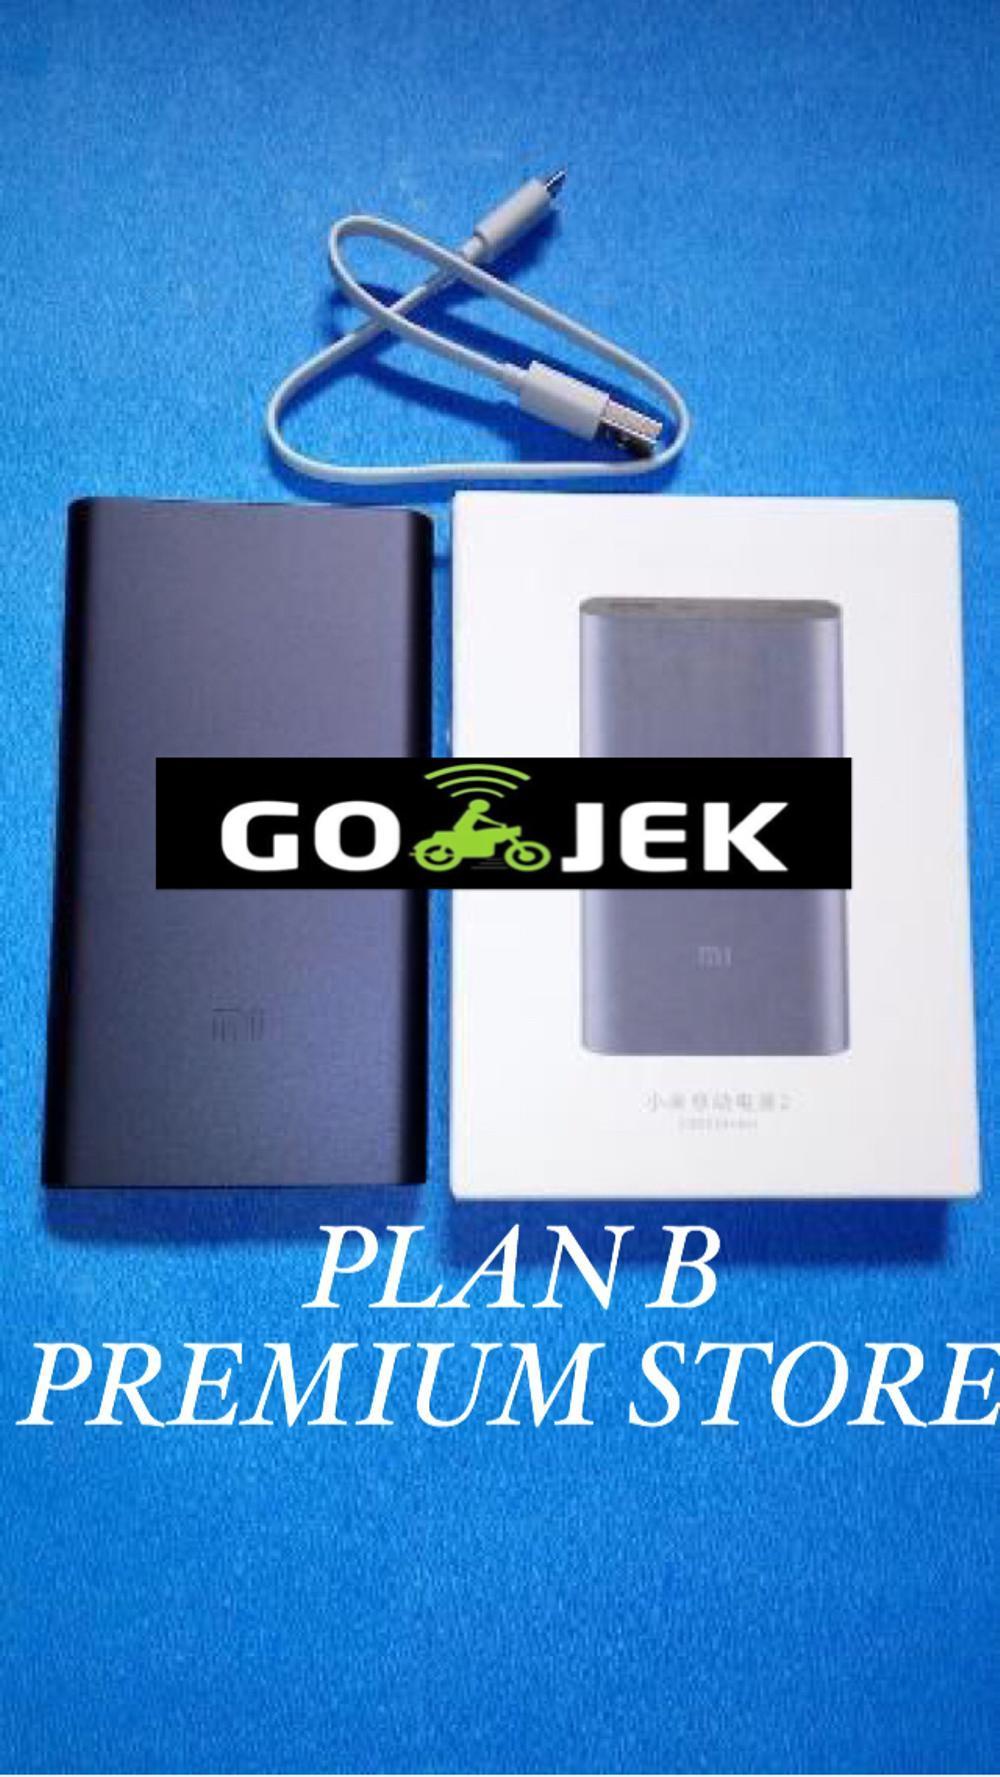 Buy Sell Cheapest Powerbank B Best Quality Product Deals Bcare 7800mah 2 Output Slim Real Polymer Batt Biru Power Bank Xiaomi Pro 10000mah 10000 Mah Fast Charging Original Di Lapak Plan